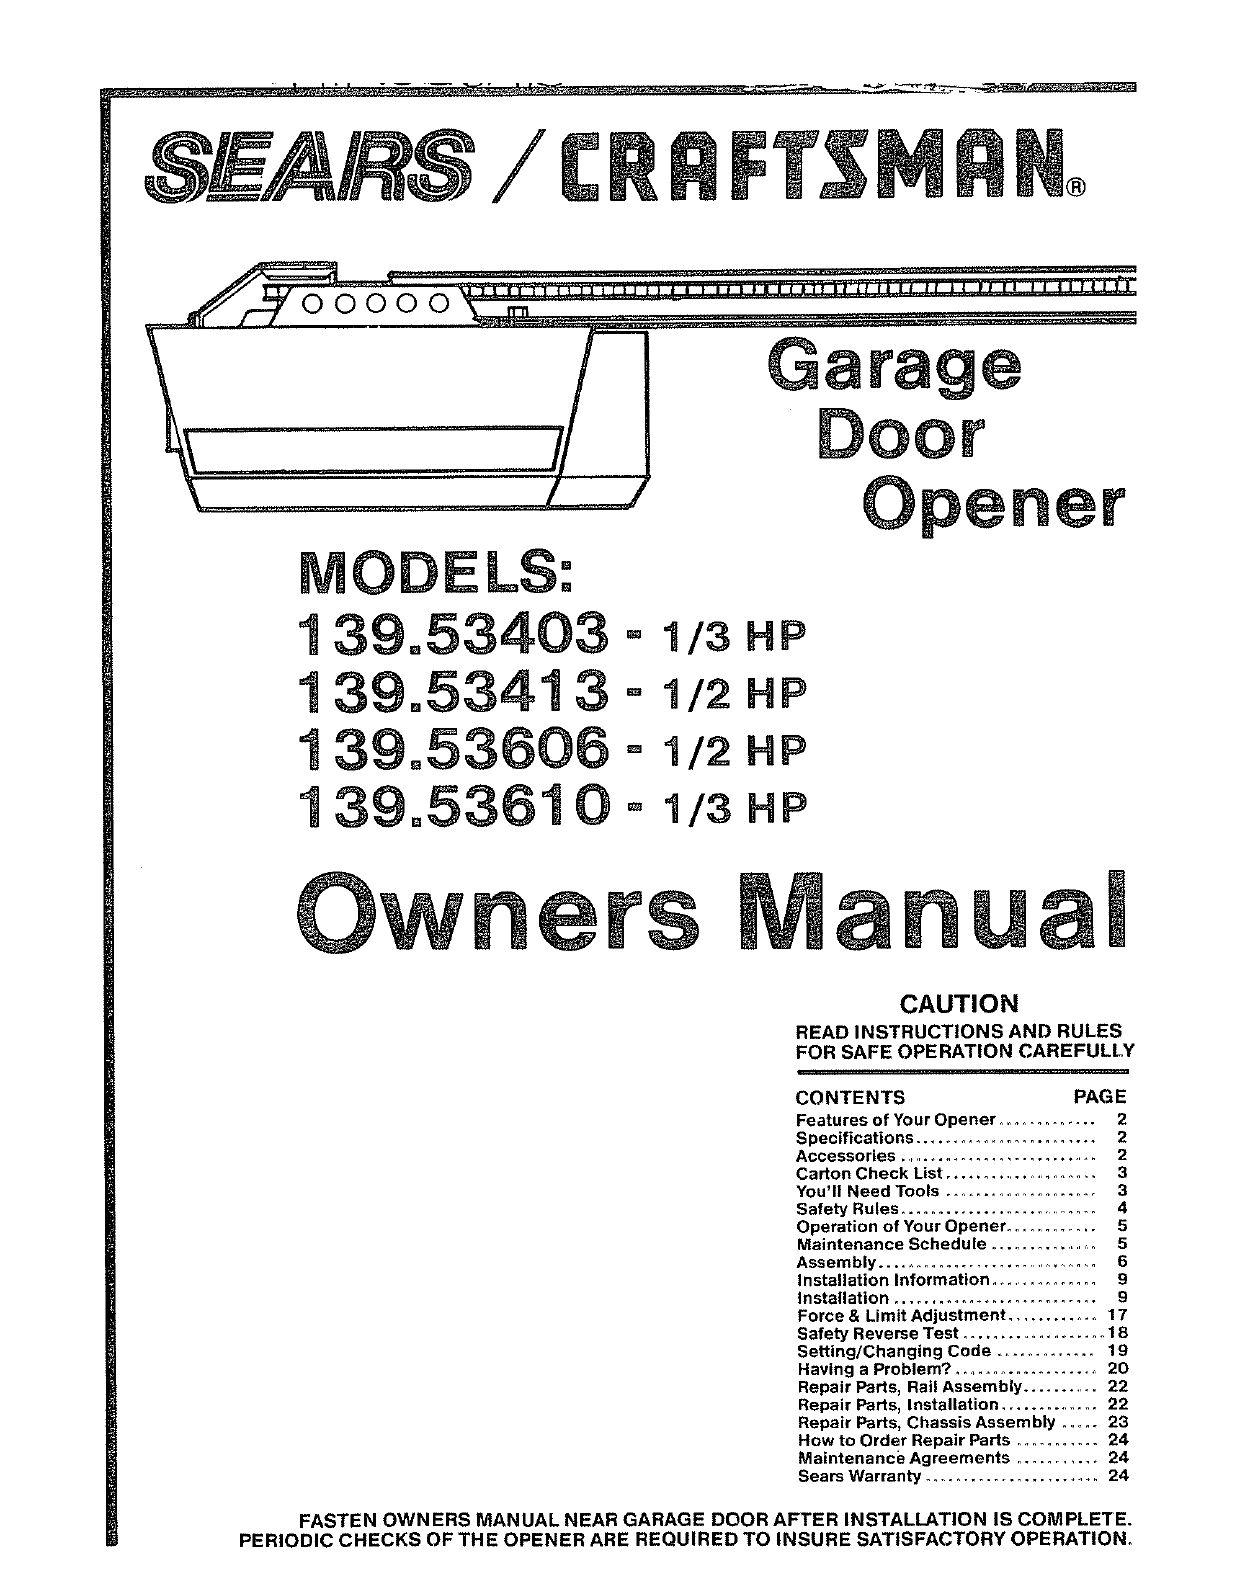 Sears Automatic Garage Door Opener Troubleshooting For Desire Http